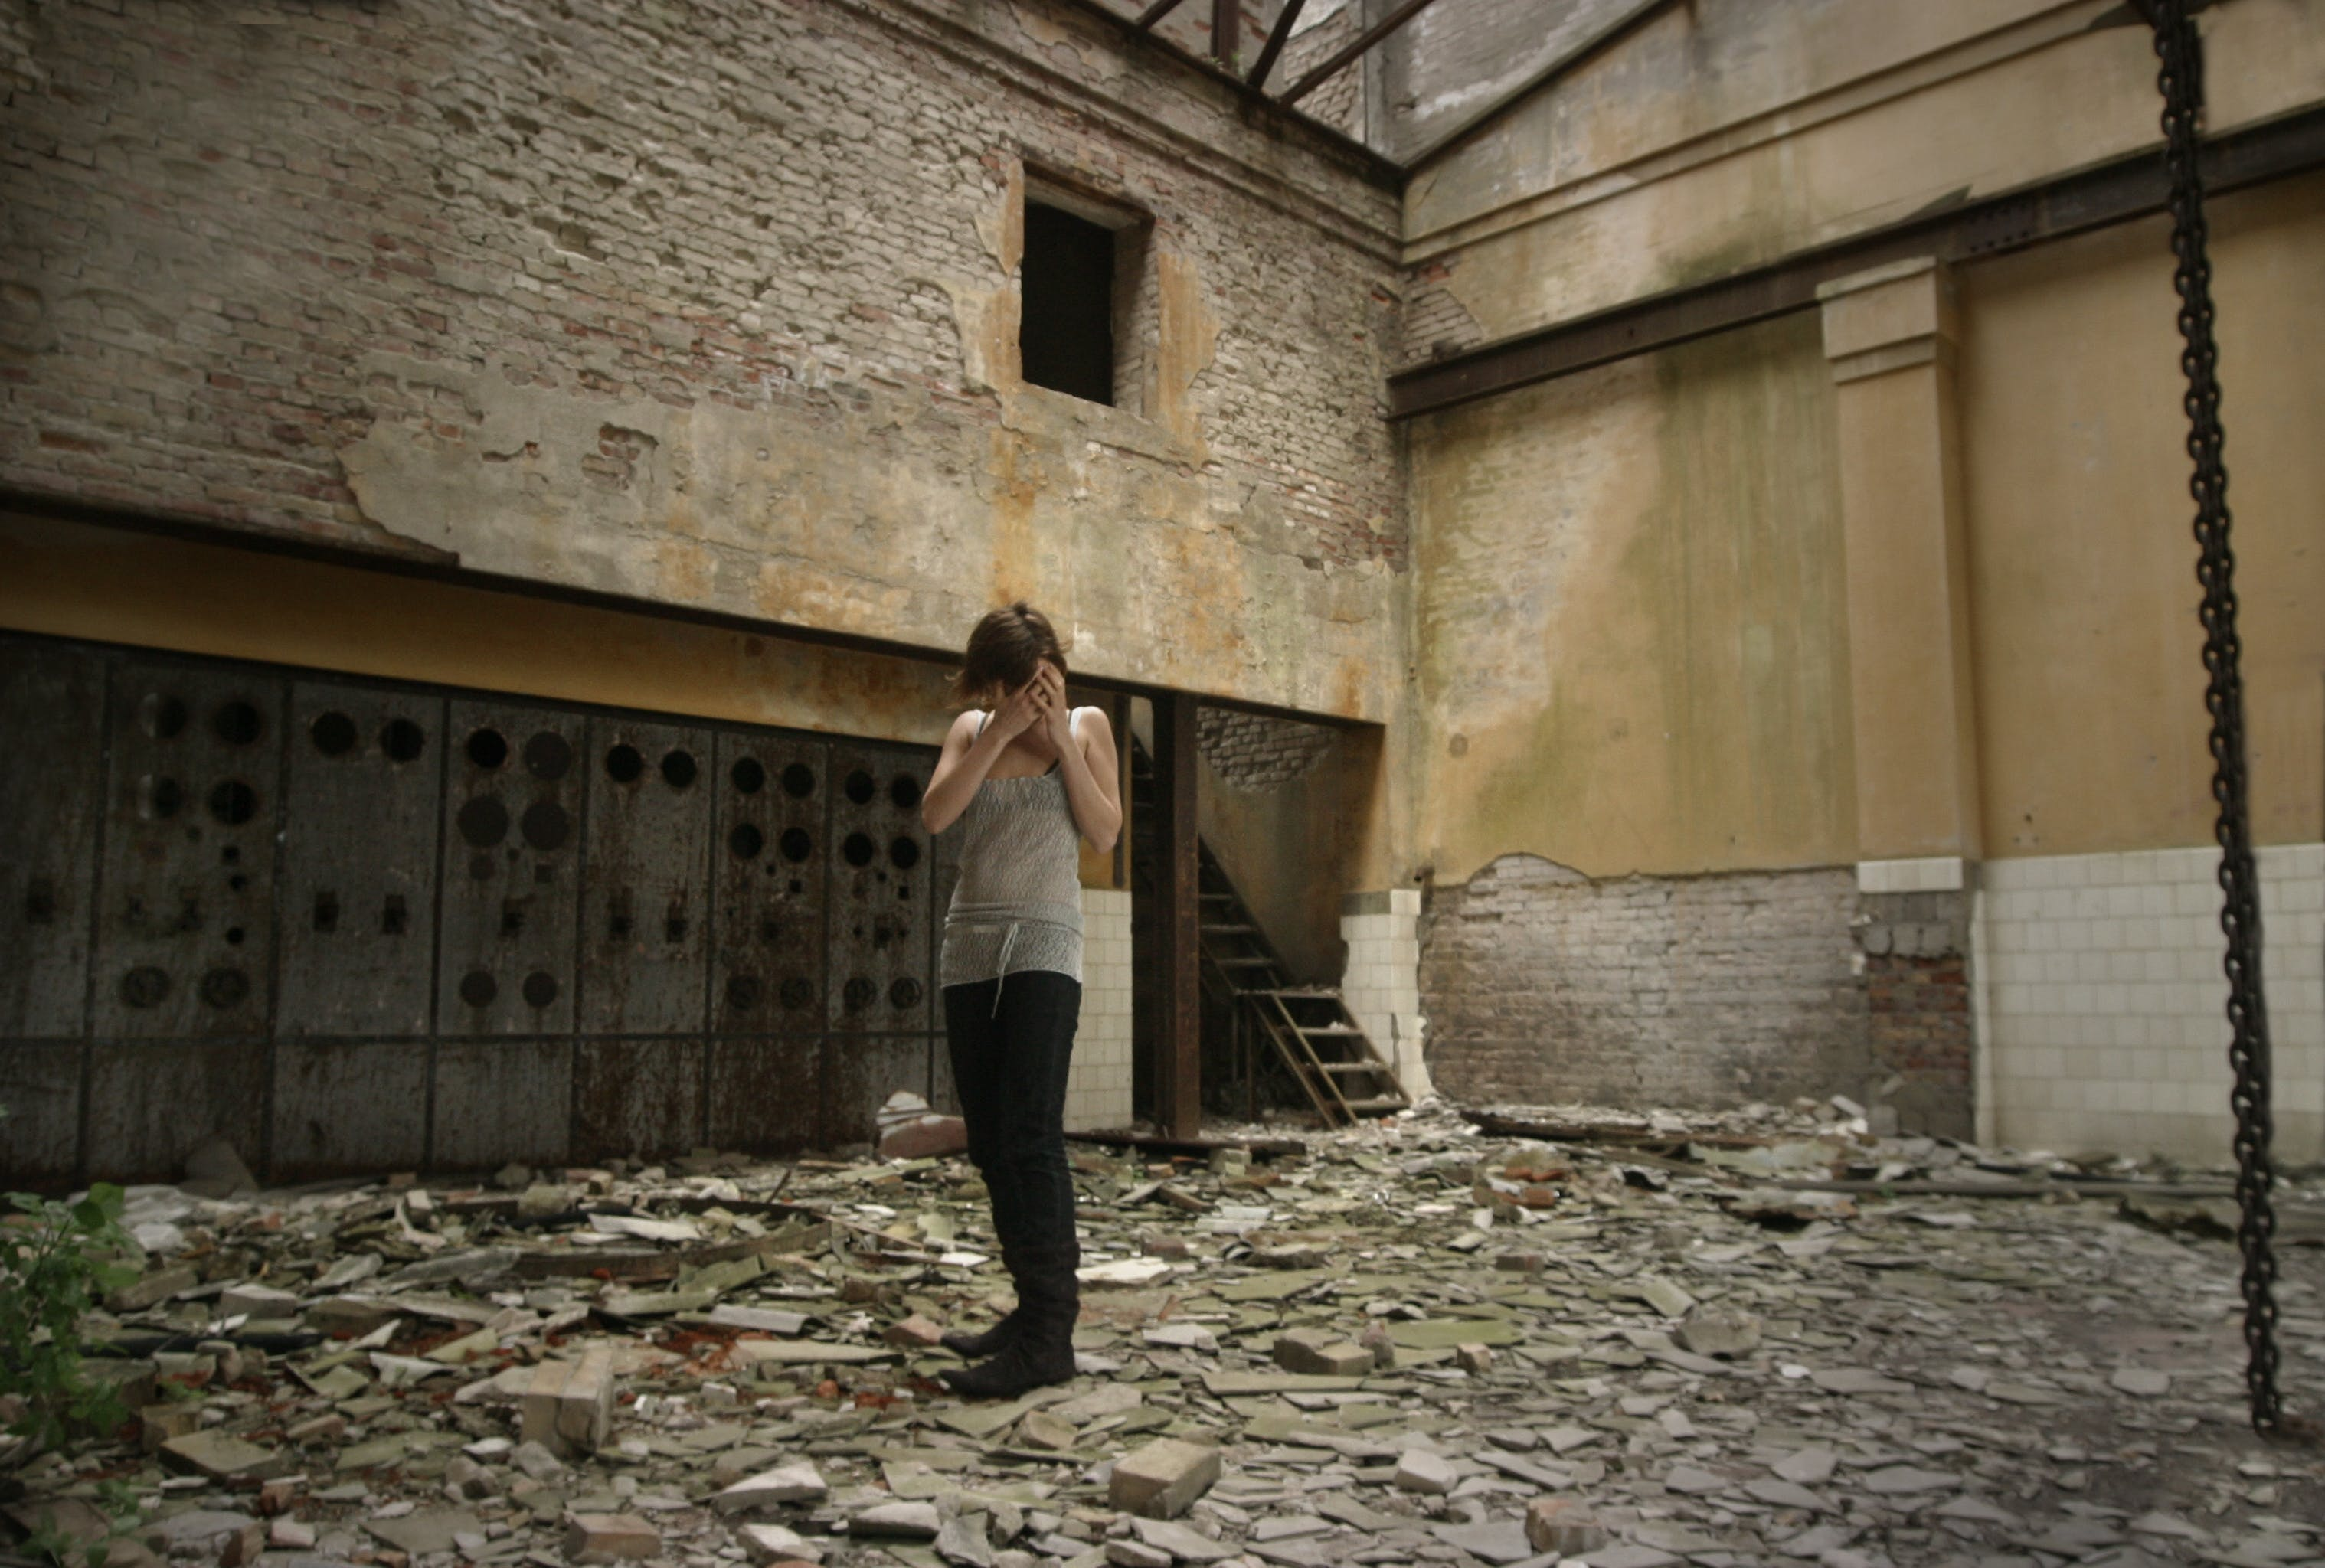 Woman Inside Building